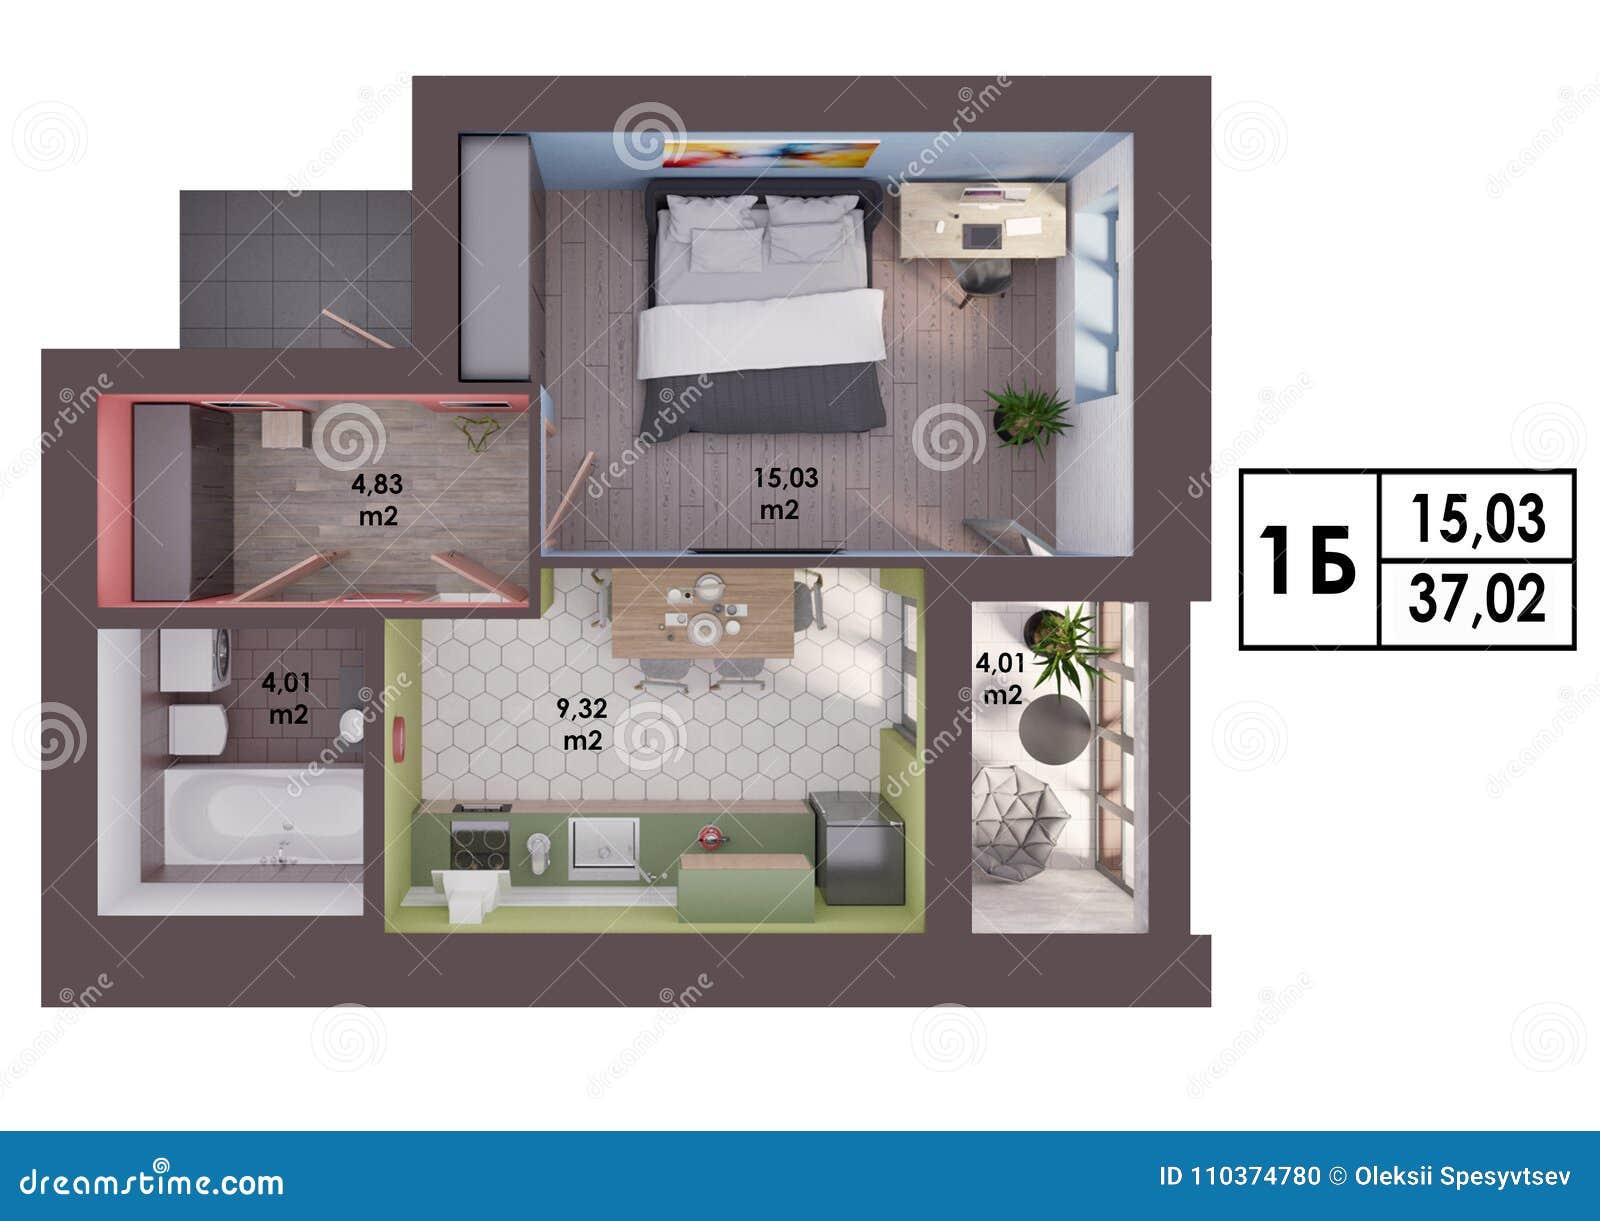 3d Render Plan Layout Of A Modern One Bedroom Apartment Stock Illustration Illustration Of Measurements Flat 110374780